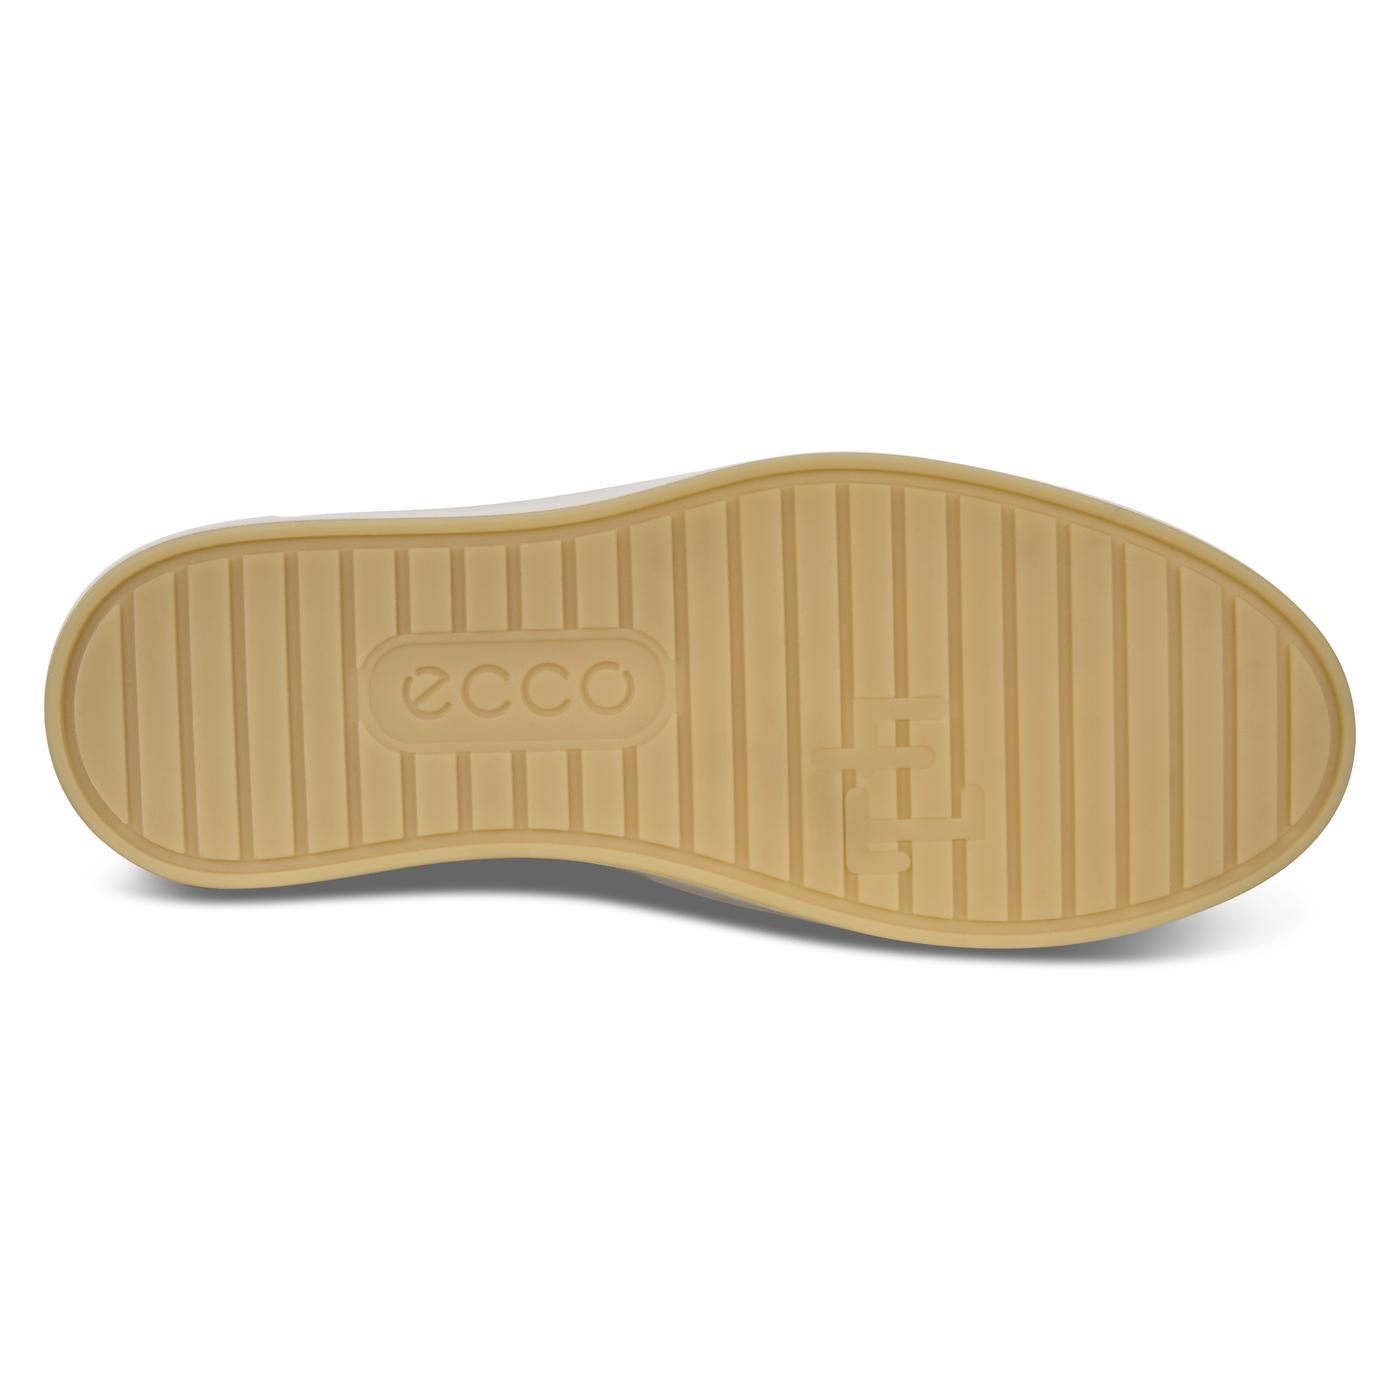 ECCO SOFT 8 LX Men's Slip-on